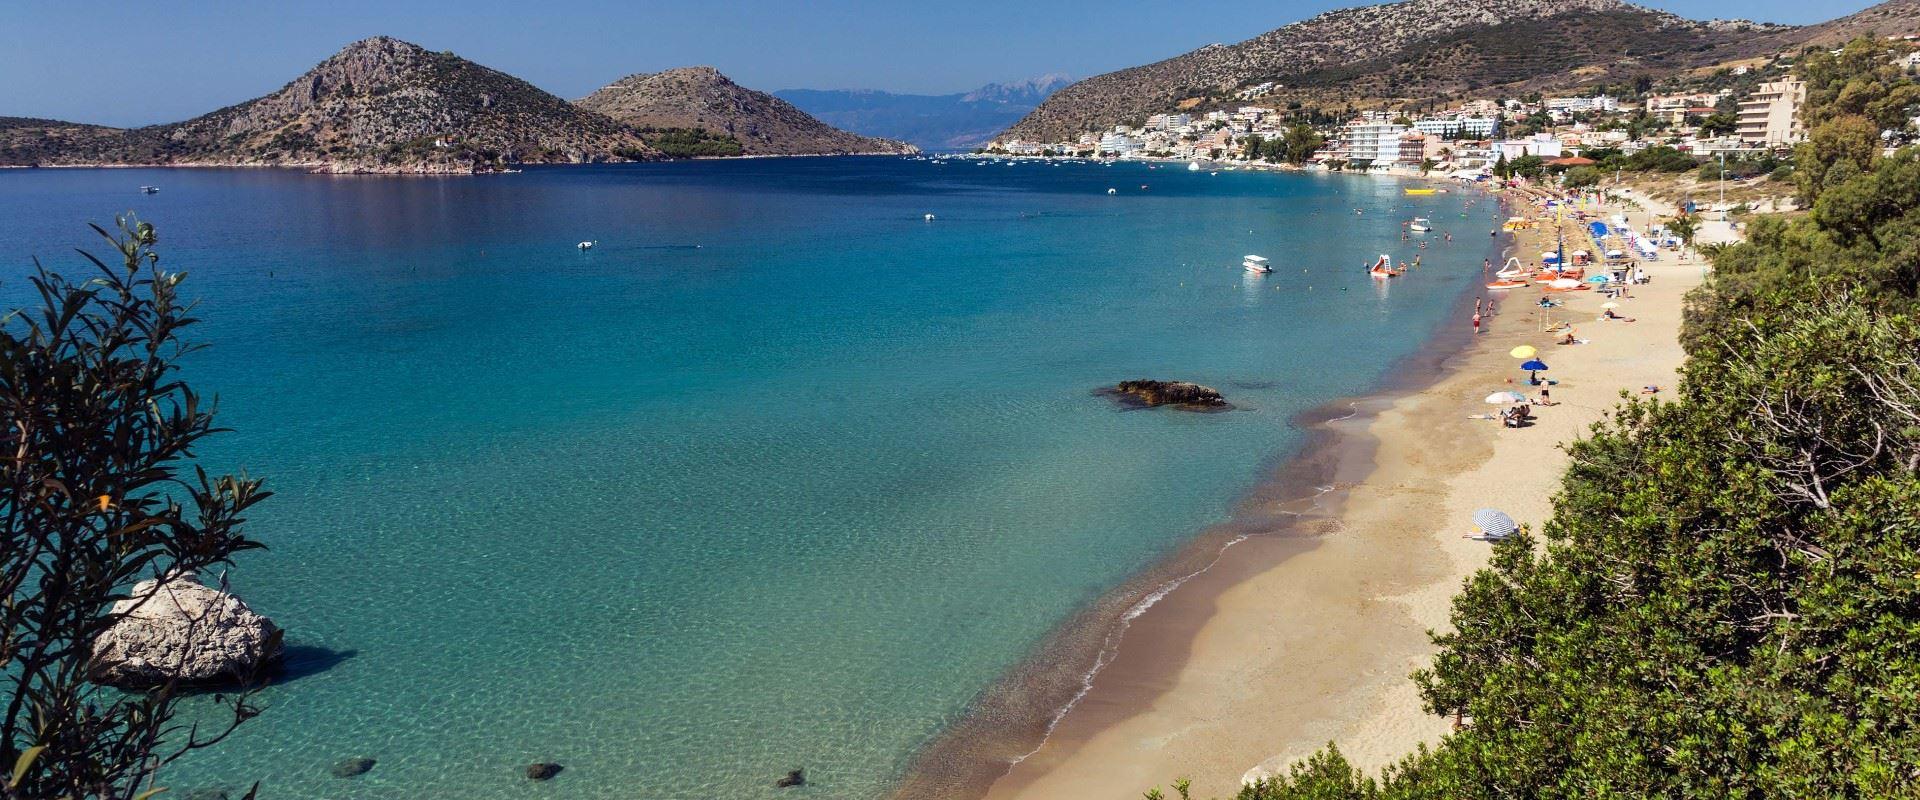 Tolon and Nafplion Holidays 2021/2022 | Tolon and Nafplion, Greece |  Sunvil.co.uk